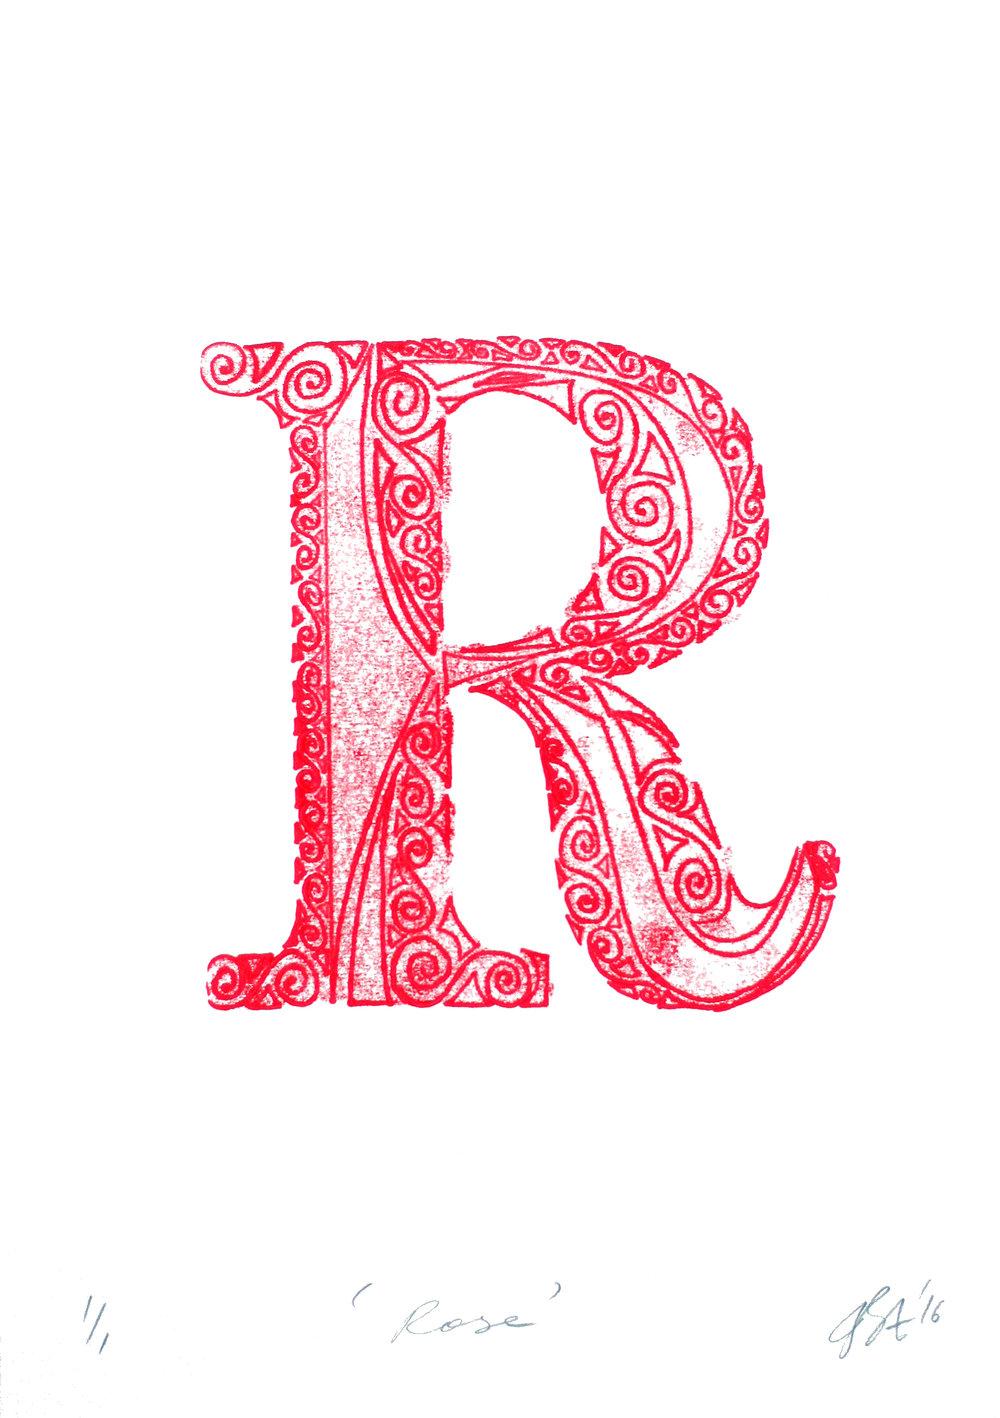 Monoprint on paper, 42 x 29.5 cm